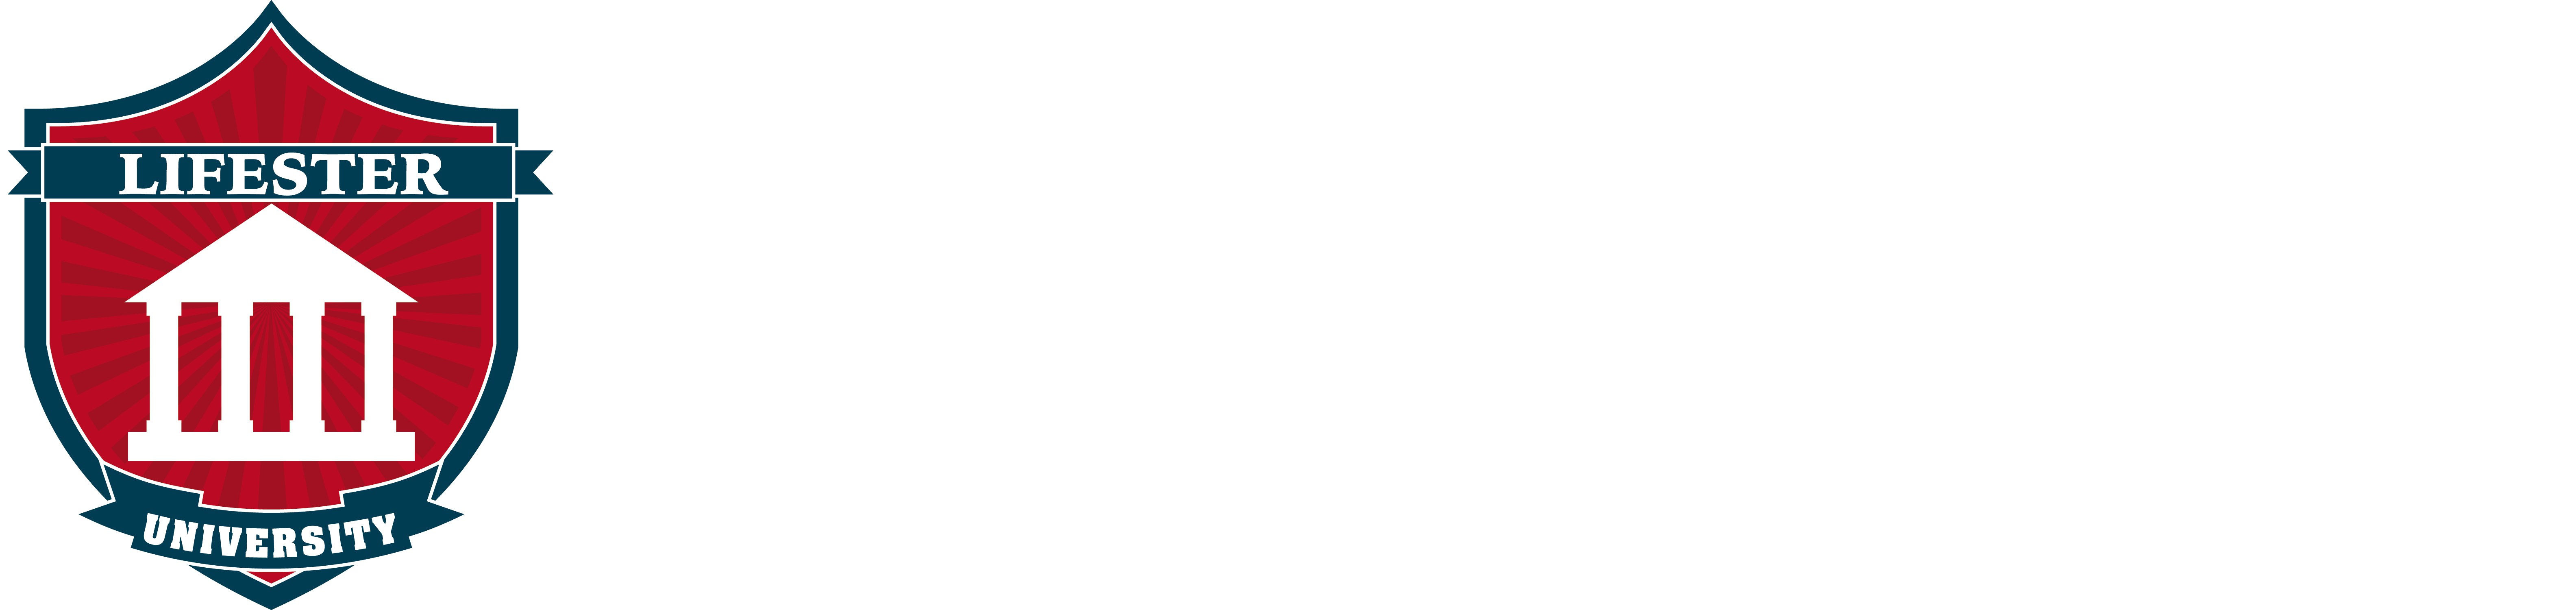 Lifester University